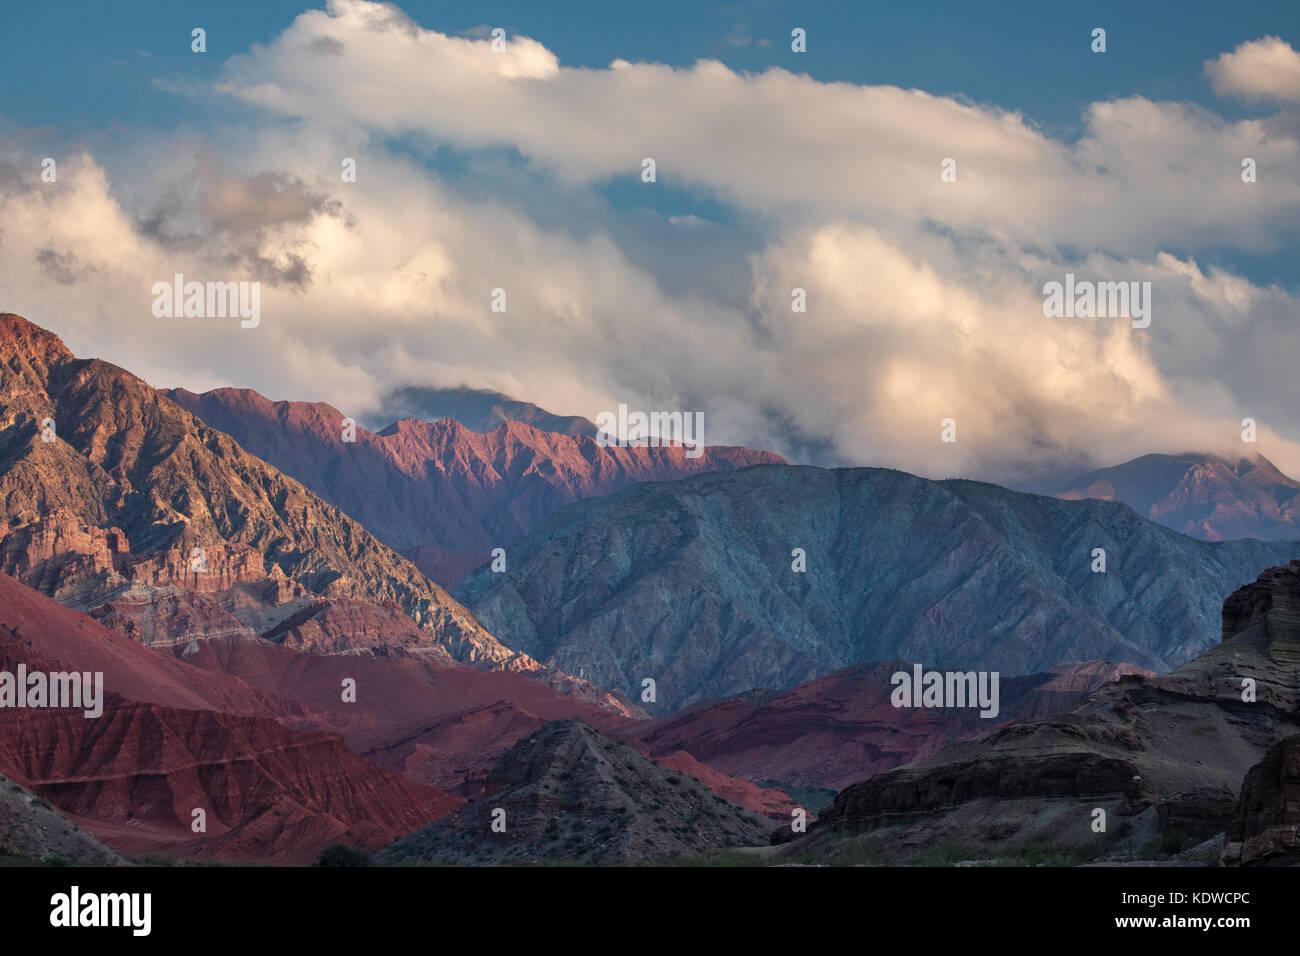 Die Quebrada de la Conches, Valles Calchaquies, Provinz Salta, Argentinien Stockfoto